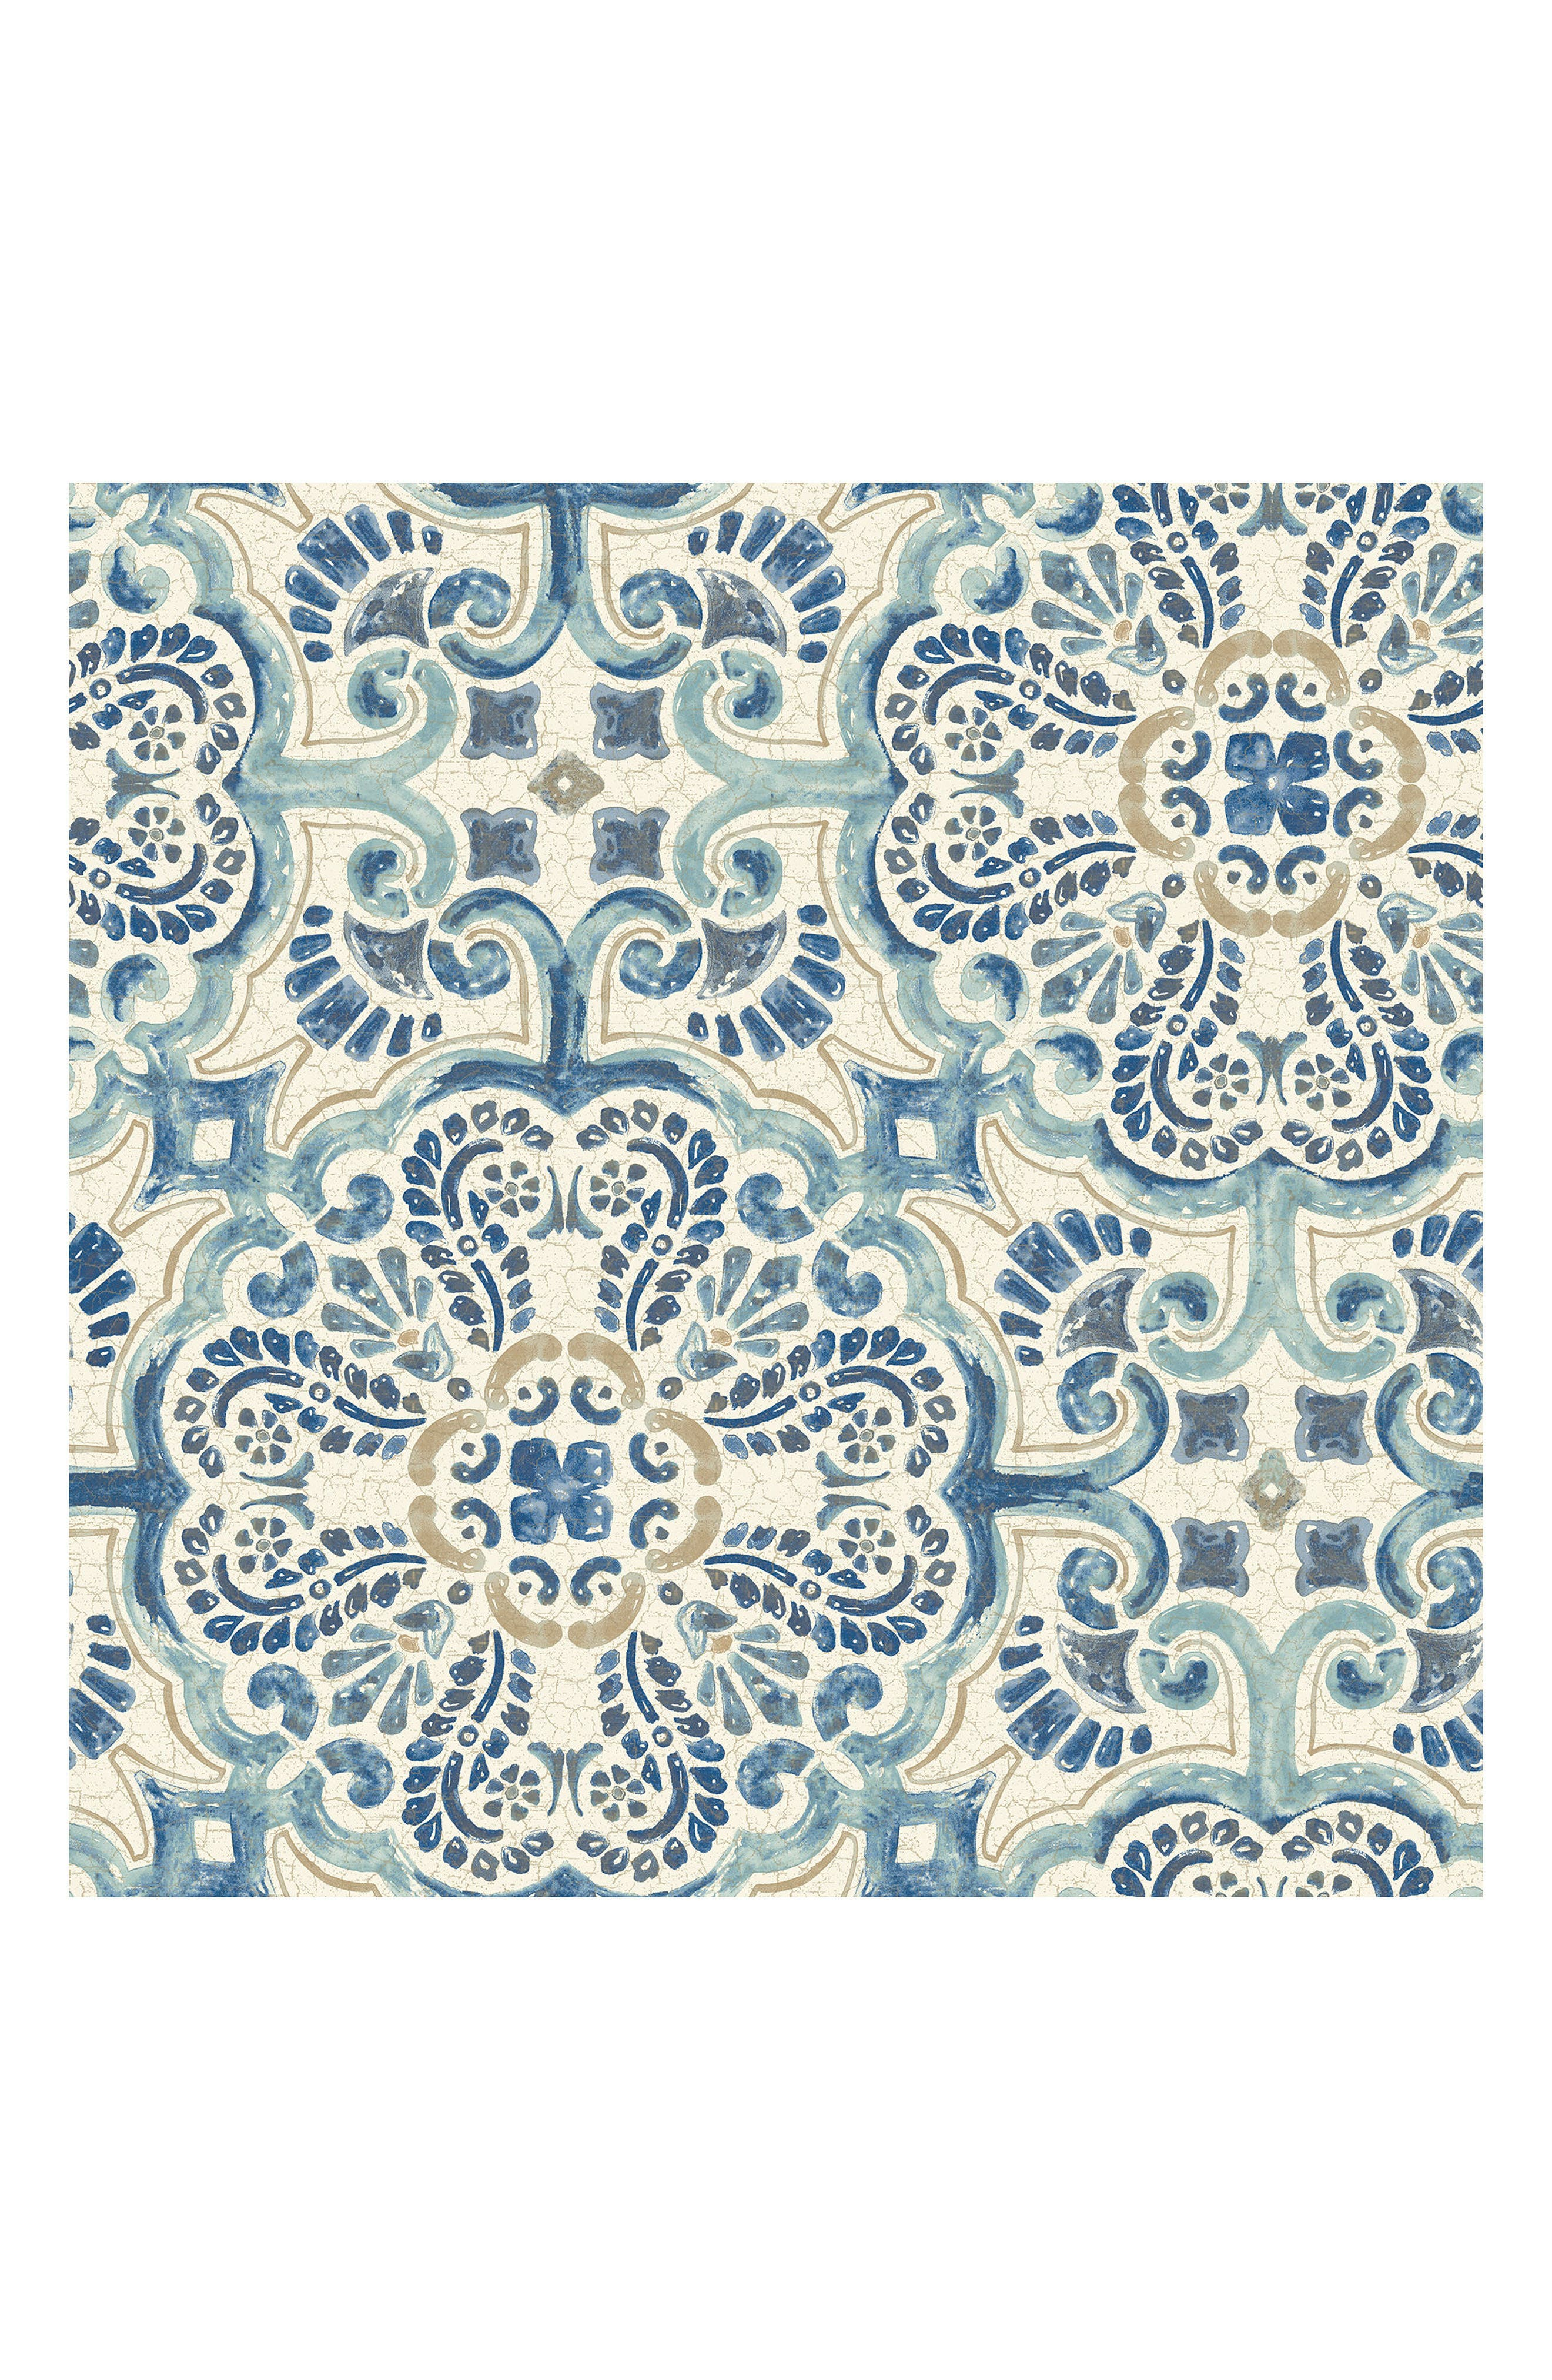 Main Image - Wallpops Blue Florentine Tile Peel & Stick Vinyl Wallpaper